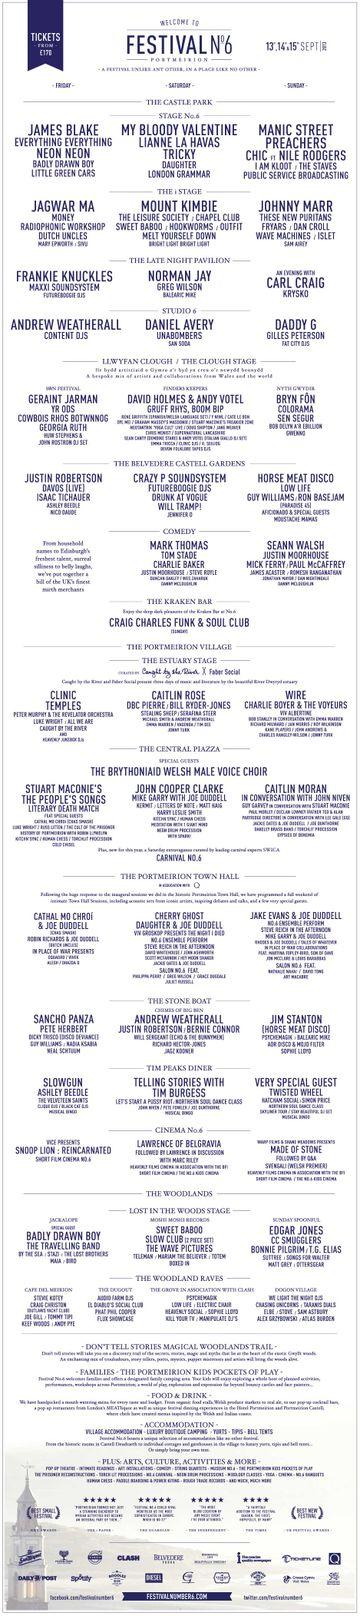 2013-09-1X - Festival No.6.jpg